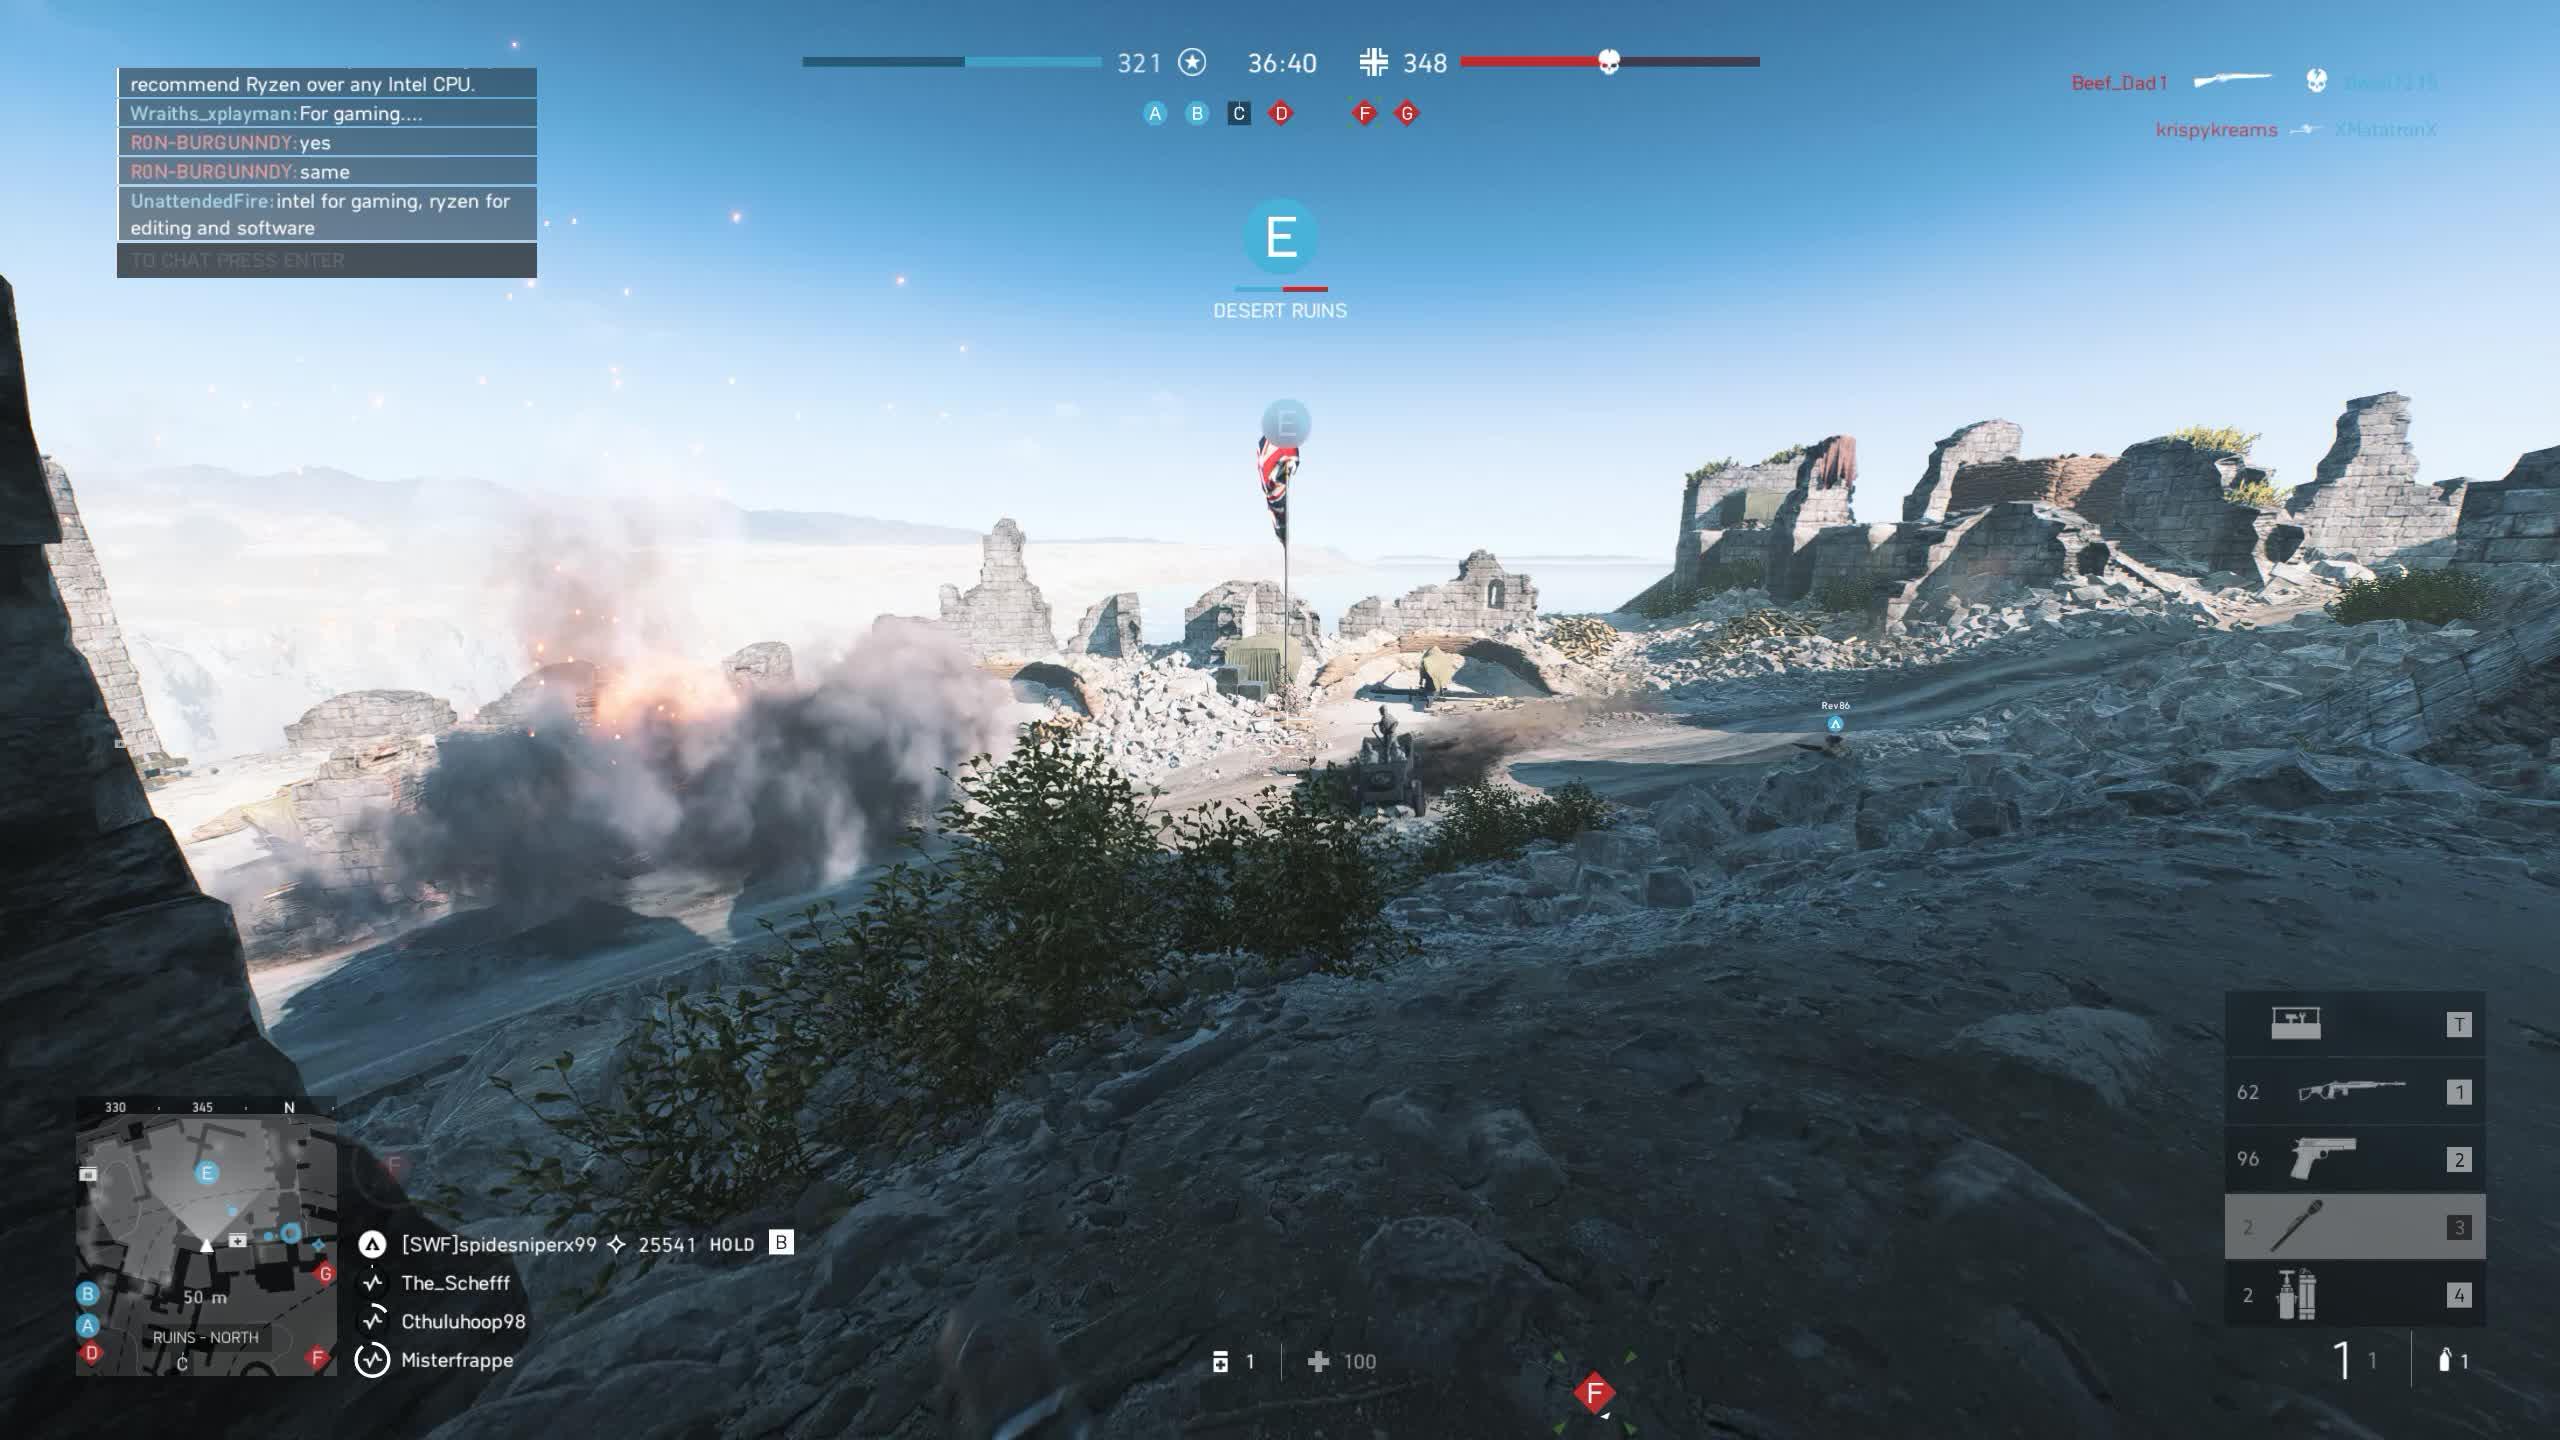 battlefield one, vlc-record-2018-11-25-23h01m53s-Battlefield V 2018.11.25 - 22.26.11.10.DVR.mp4- GIFs